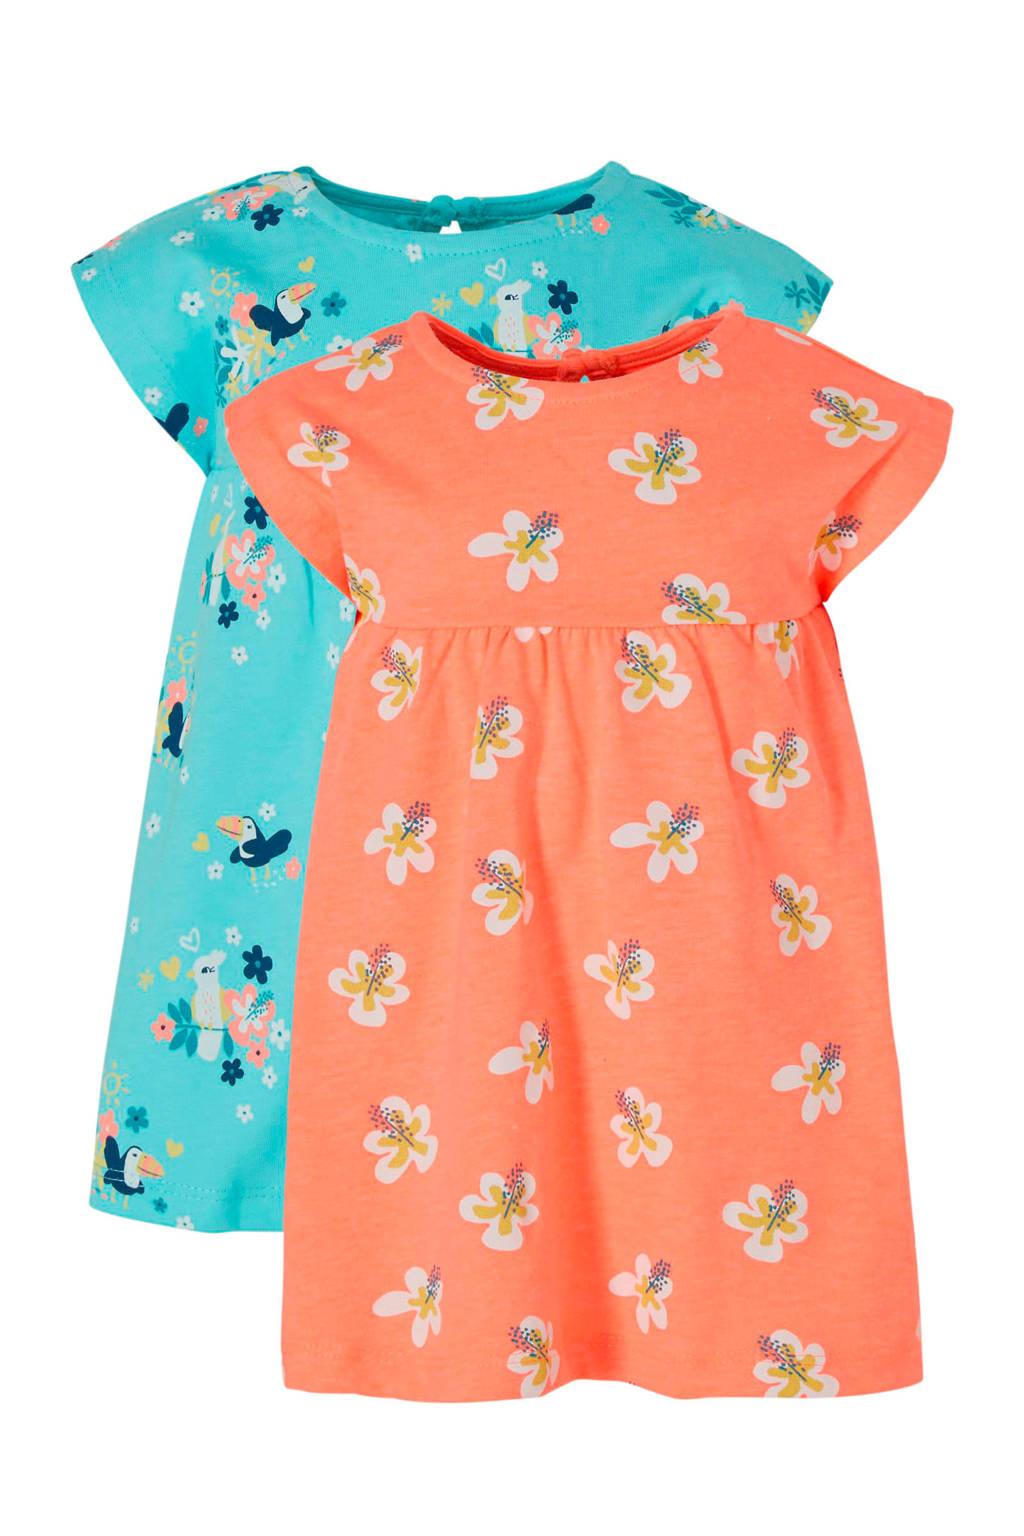 C&A Baby Club gebloemde jurk - set van 2, Lichtblauw/Oranje